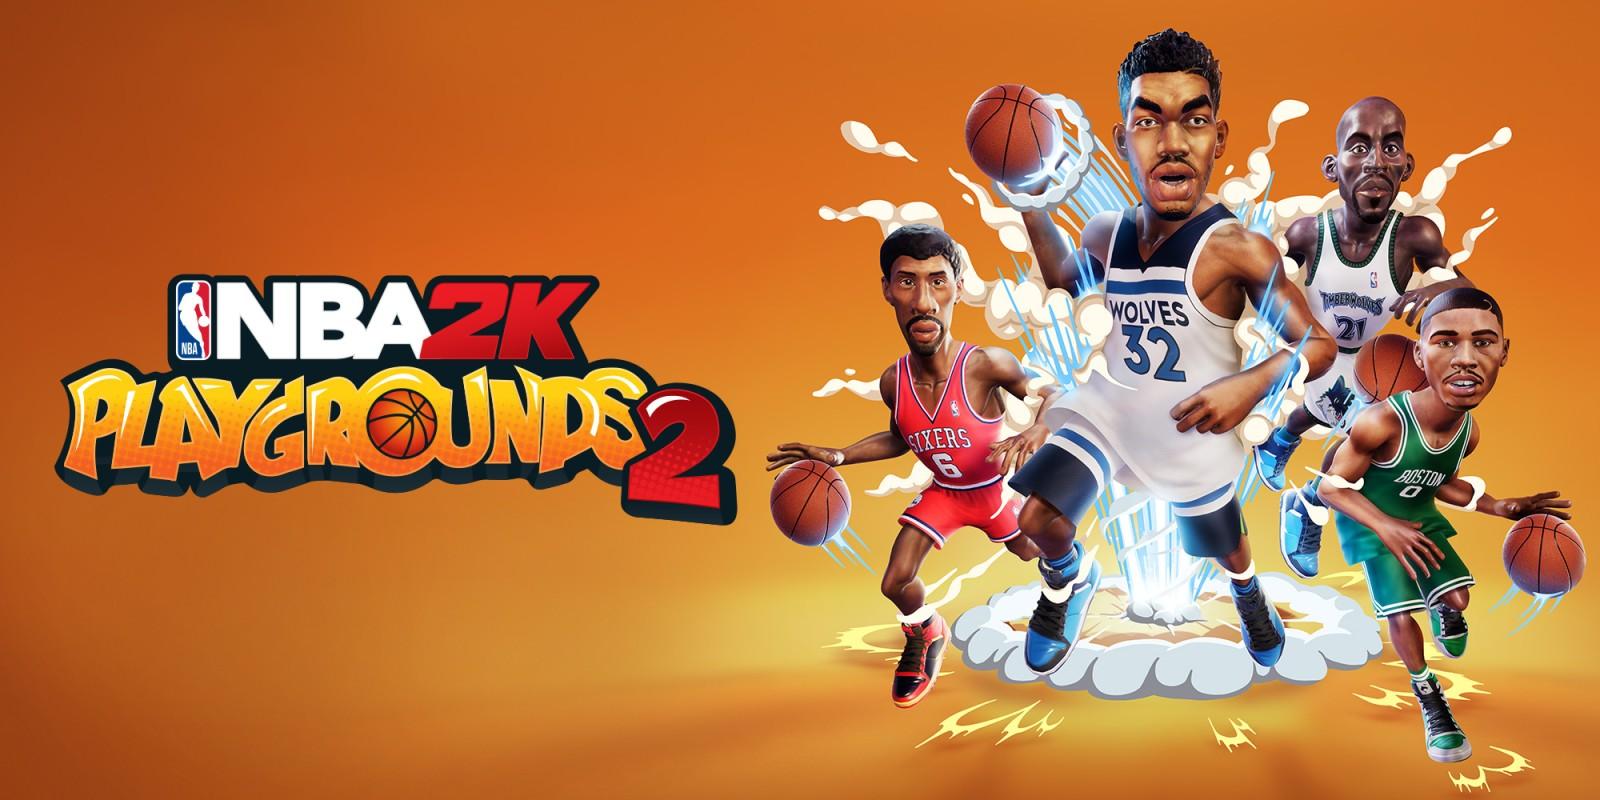 Nba 2k Playgrounds 2 Review: NBA 2K Playgrounds 2